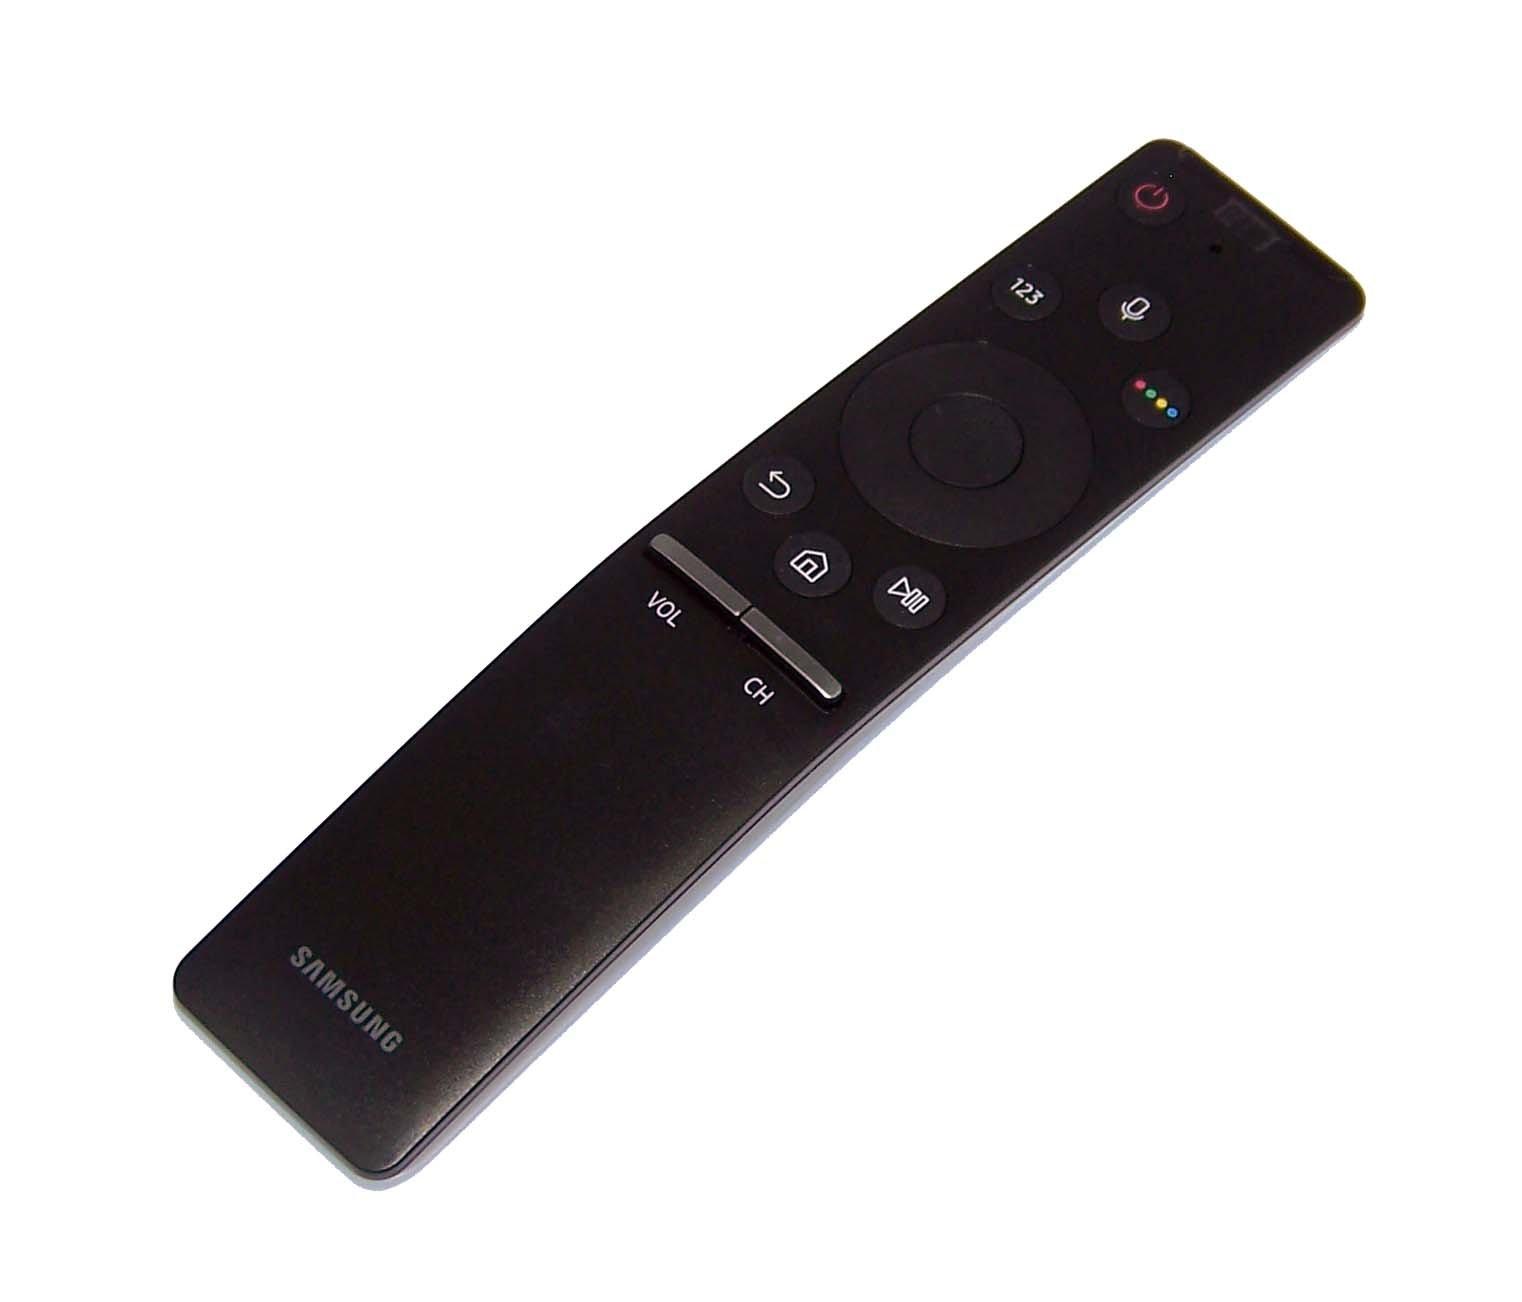 OEM Samsung Remote Control Supplied With Samsung Models UN55MU7500F, UN55MU7500FXZA, UN55MU7600F, UN55MU7600FXZA, UN55MU8000F, UN55MU8000FXZA